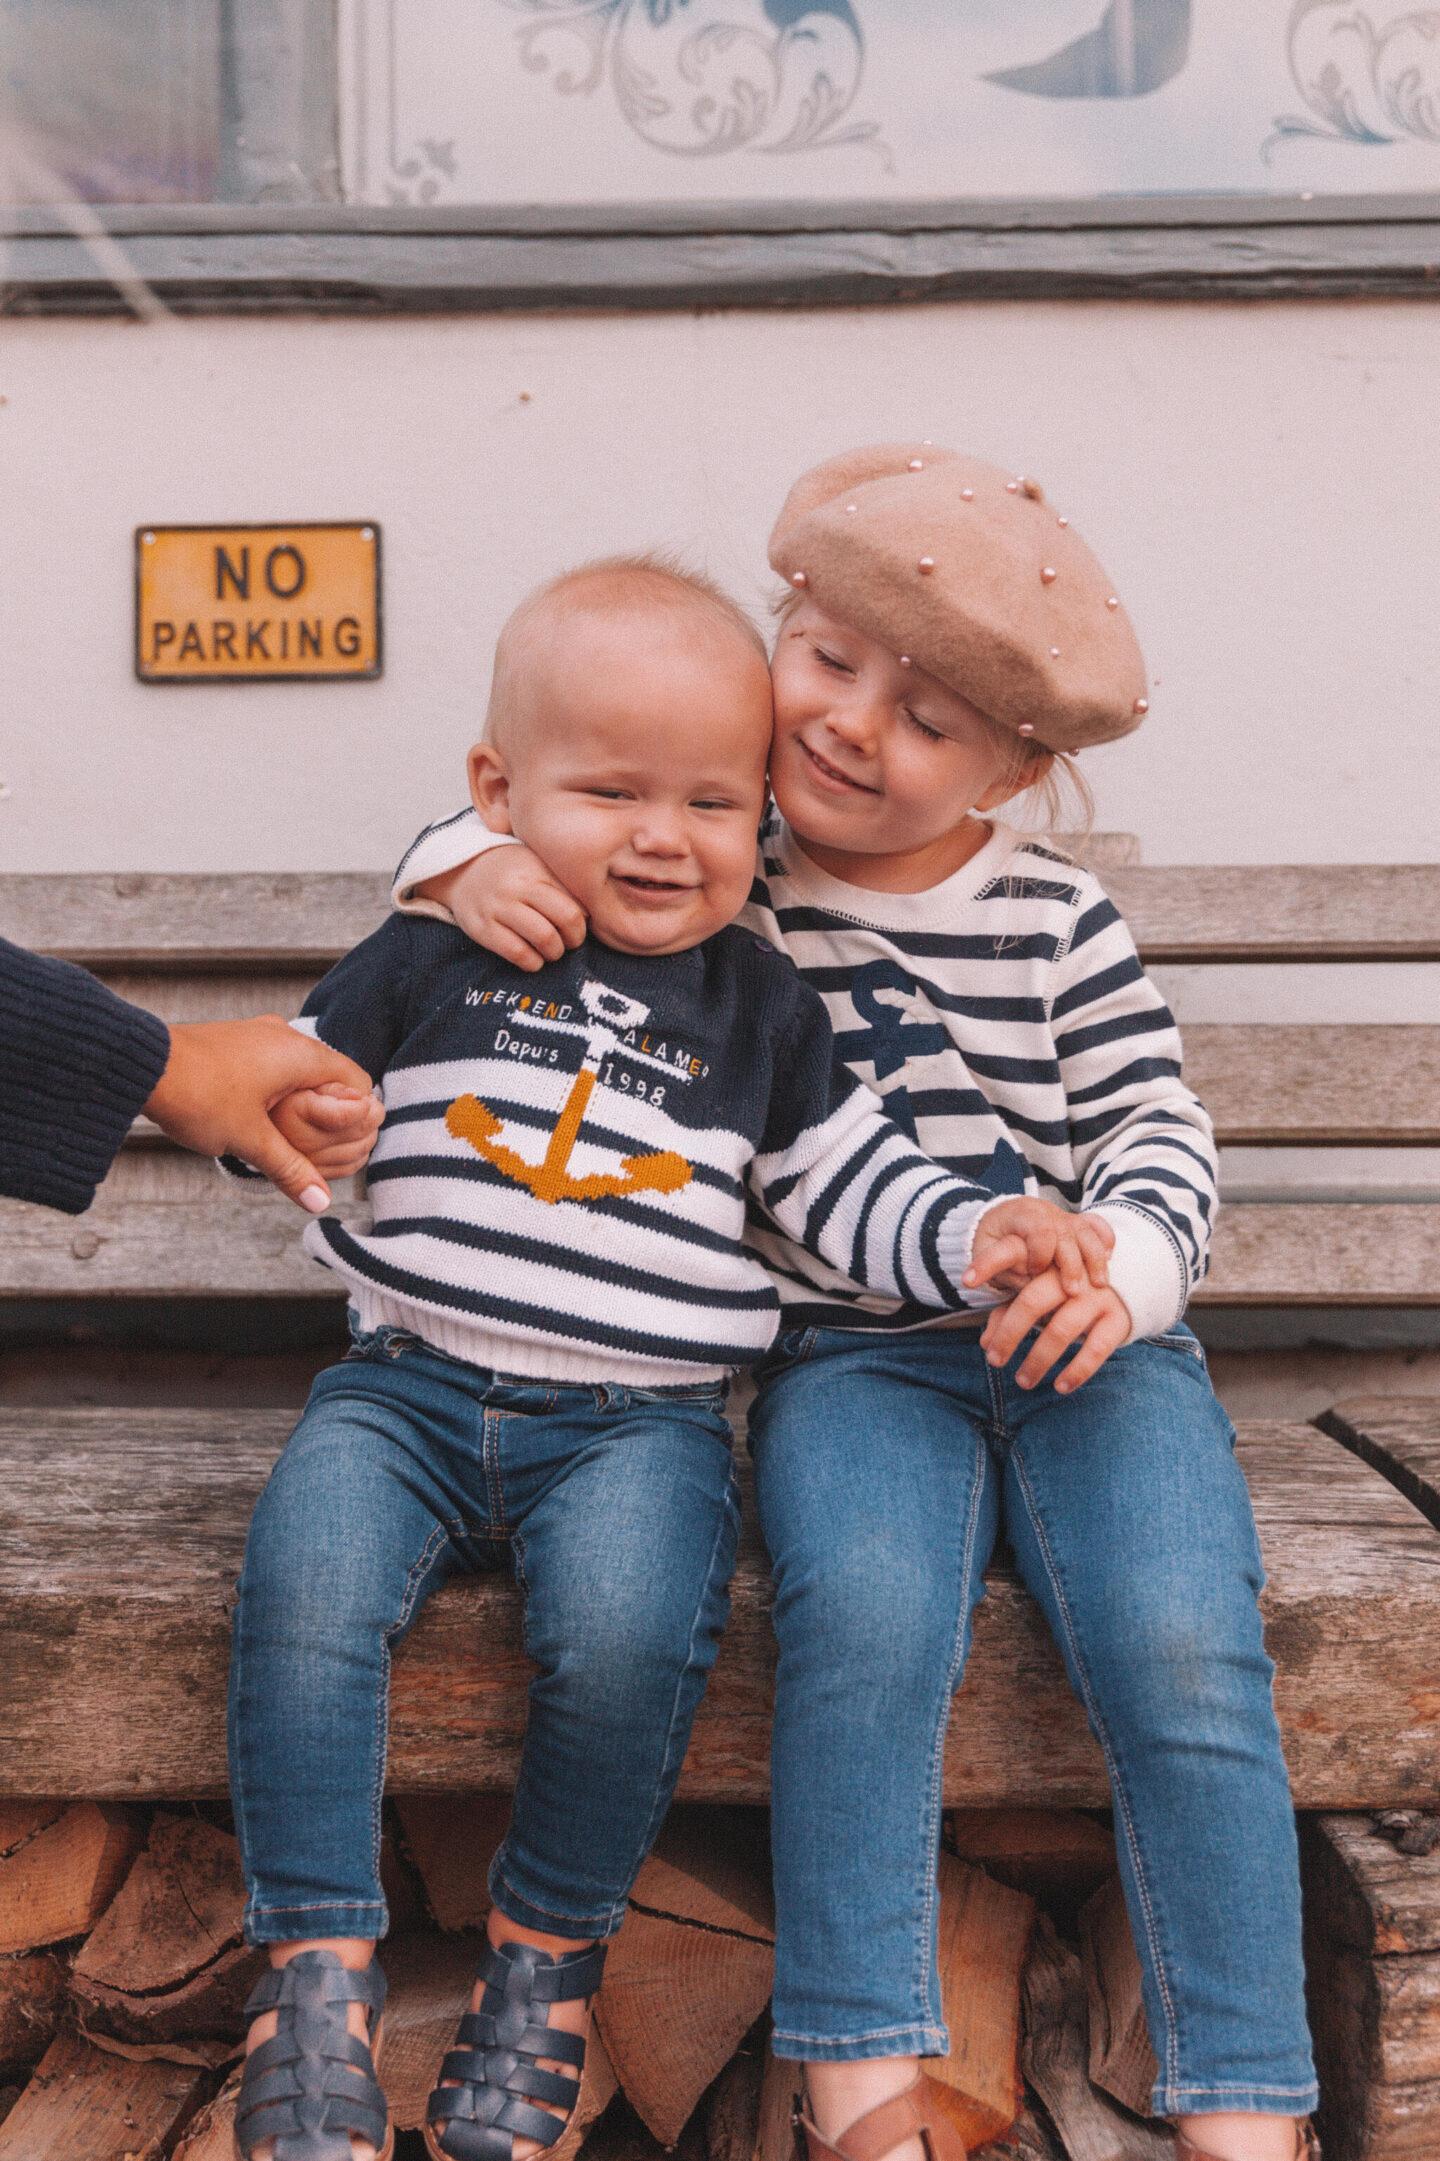 Nautical-Outfits-Kids-02